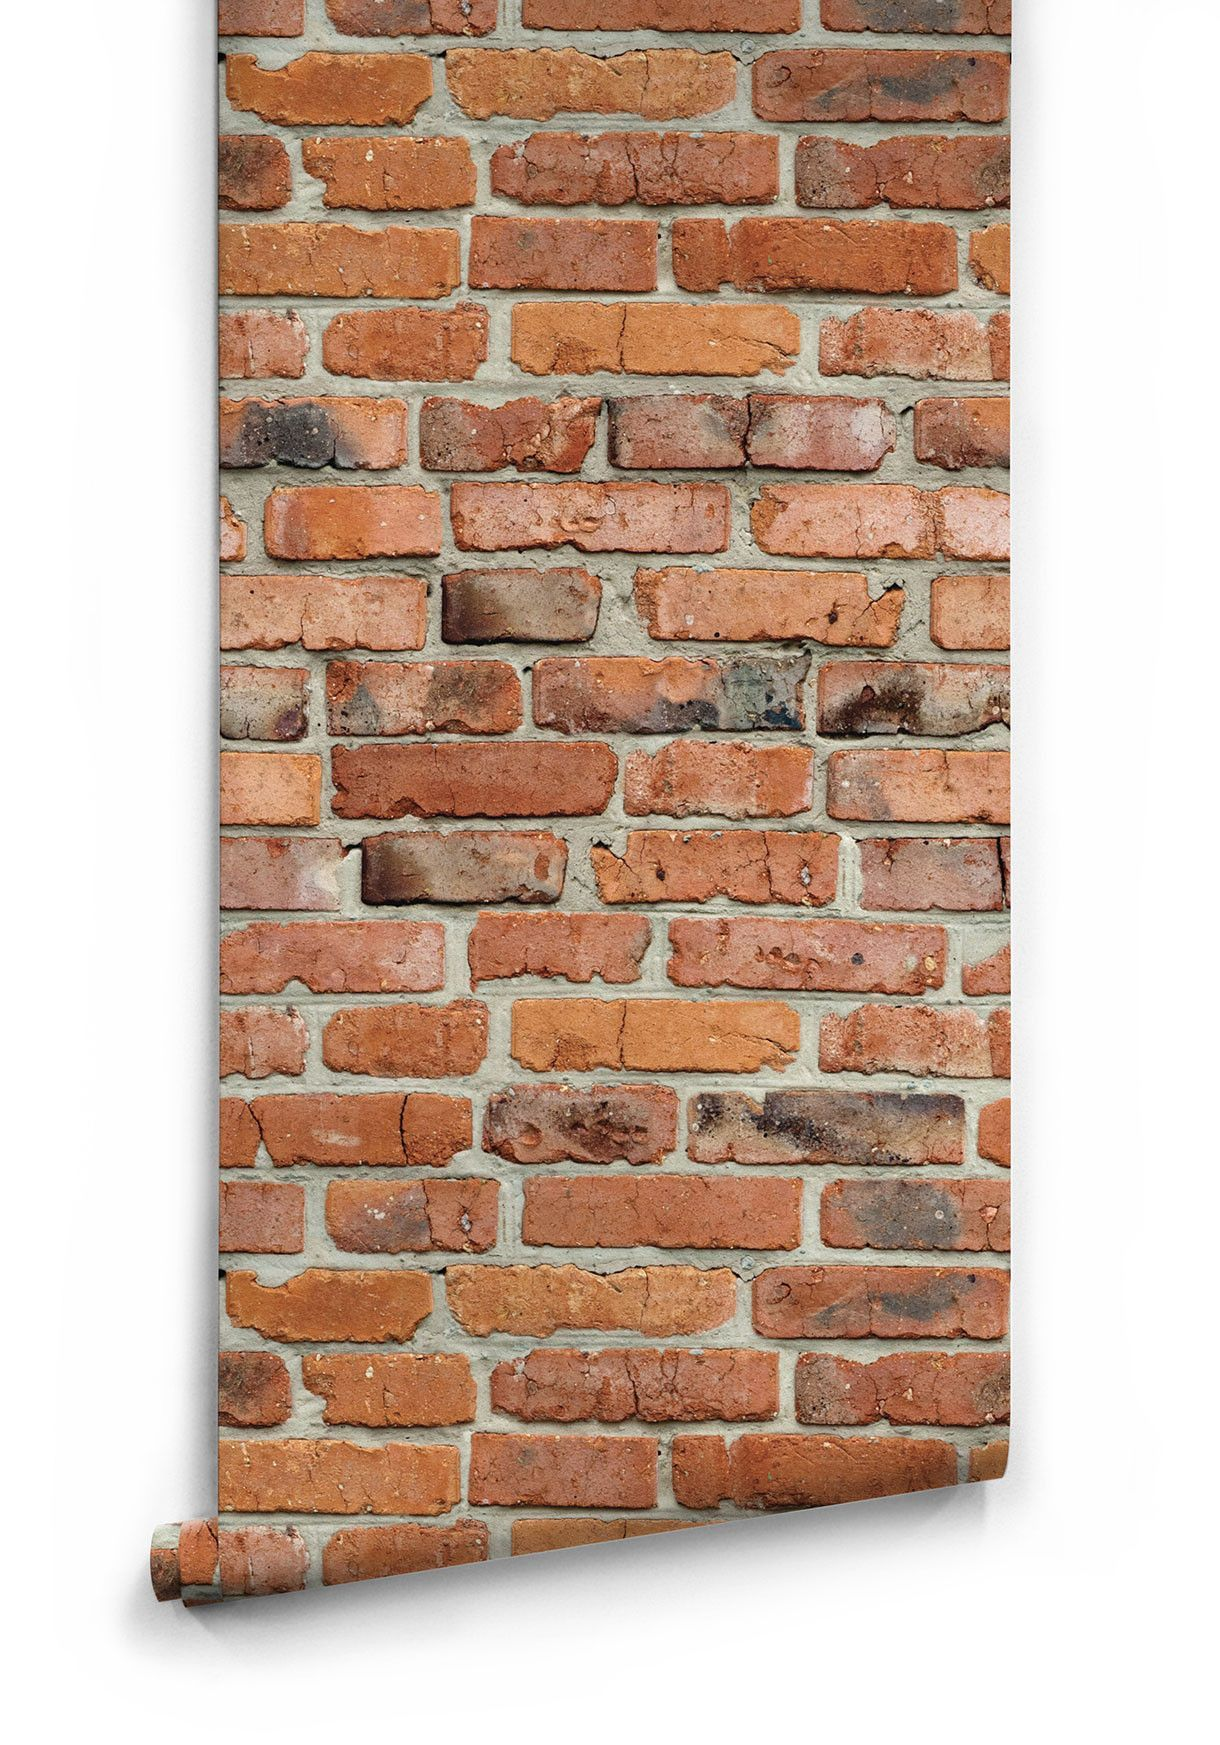 Camden Factory Bricks Wallpaper Design By Milton King Sharedhosting V Scloudhosting Perfectdescri Brick Wallpaper Faux Brick Wallpaper Brick Effect Wallpaper